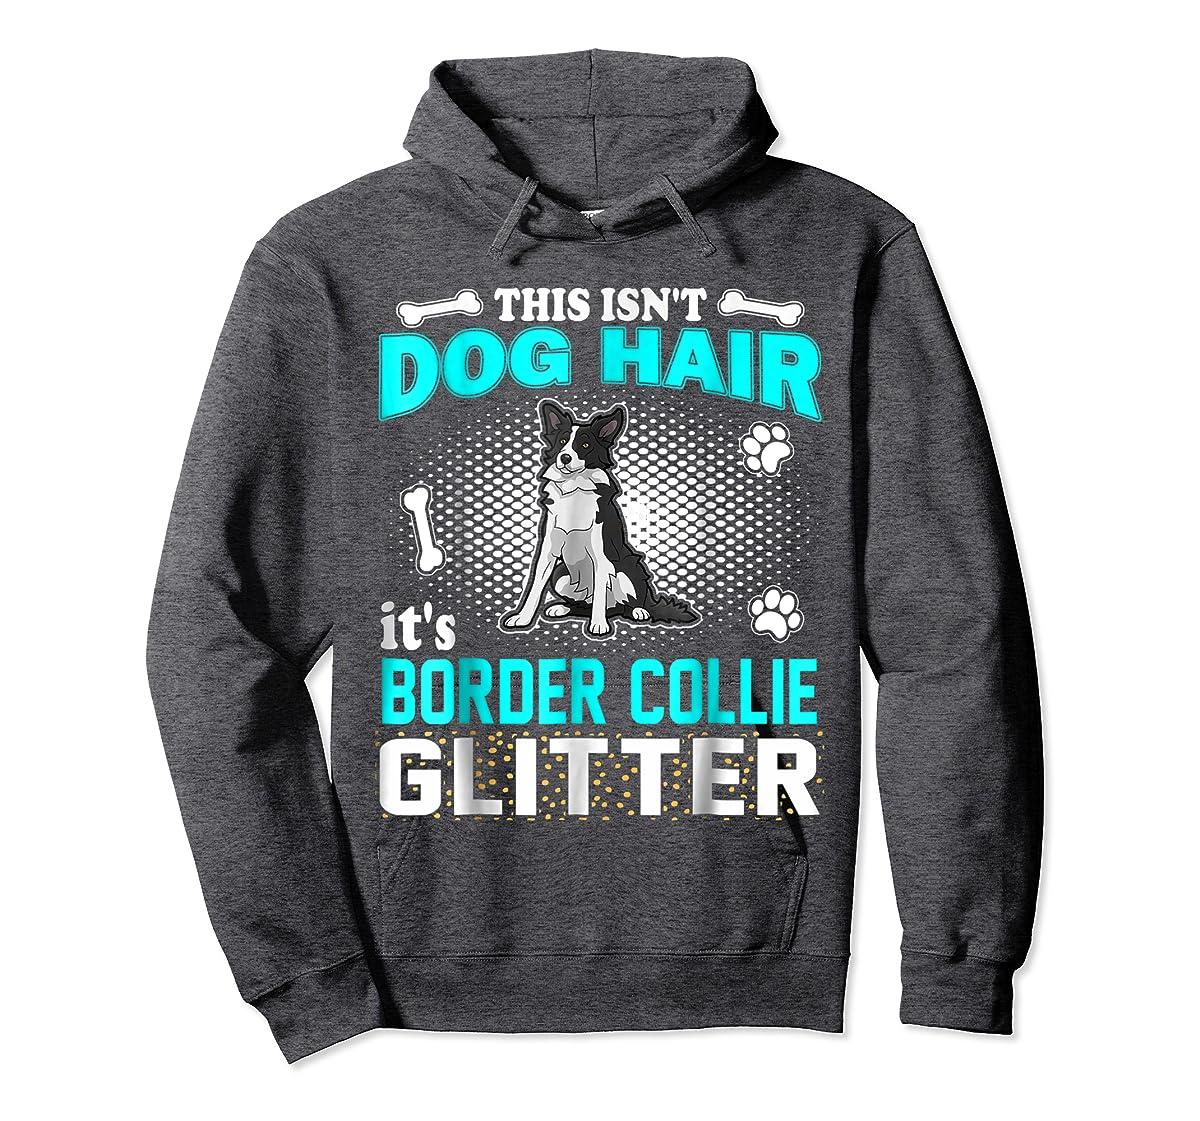 This Isn't Dog Hair It's Border Collie Glitter T-Shirt-Hoodie-Dark Heather